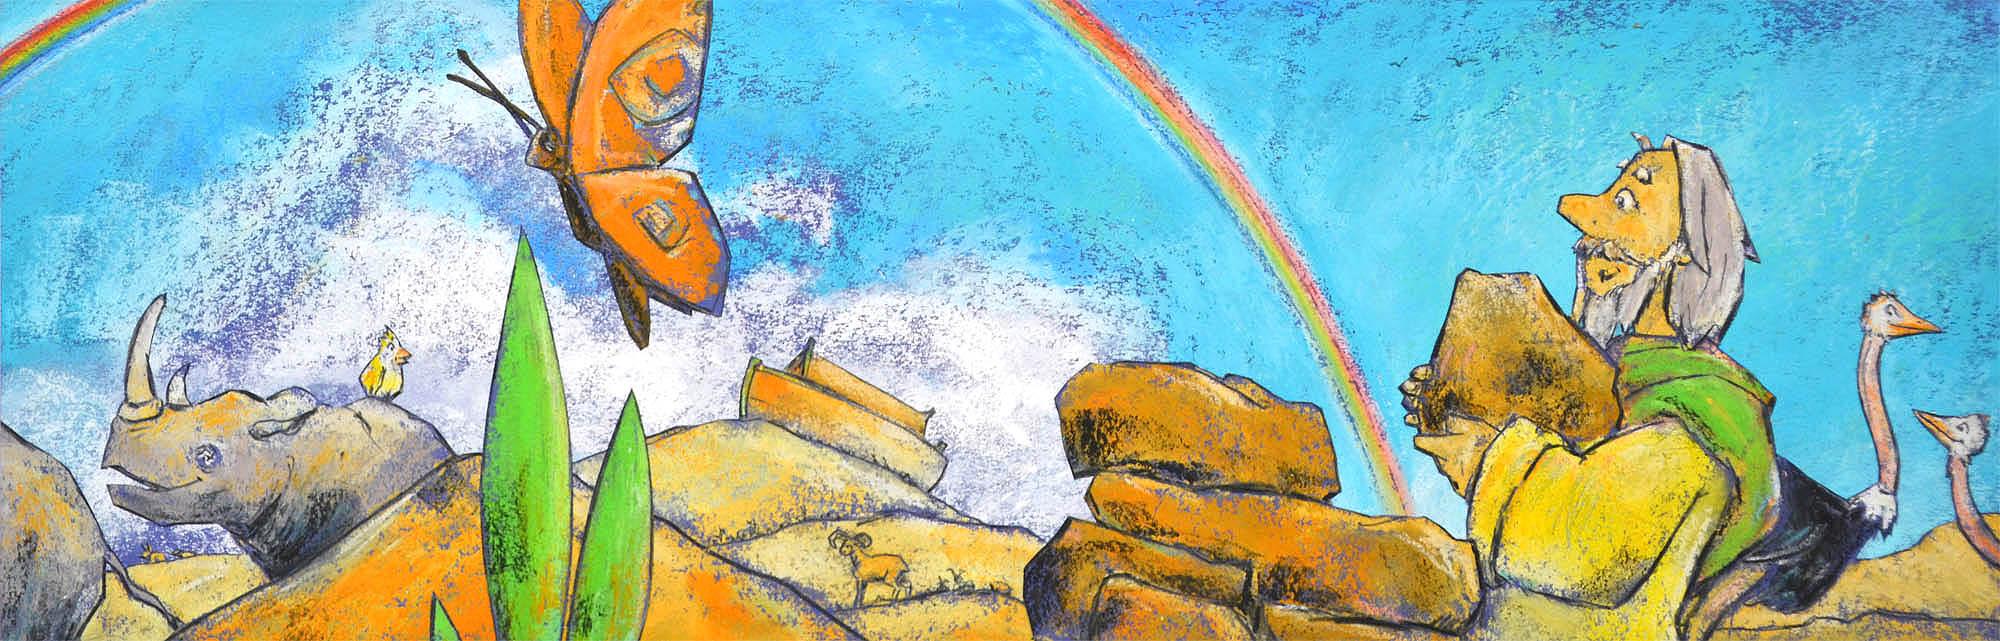 Arche Noah, Dieter Konsek, Kinderbibel